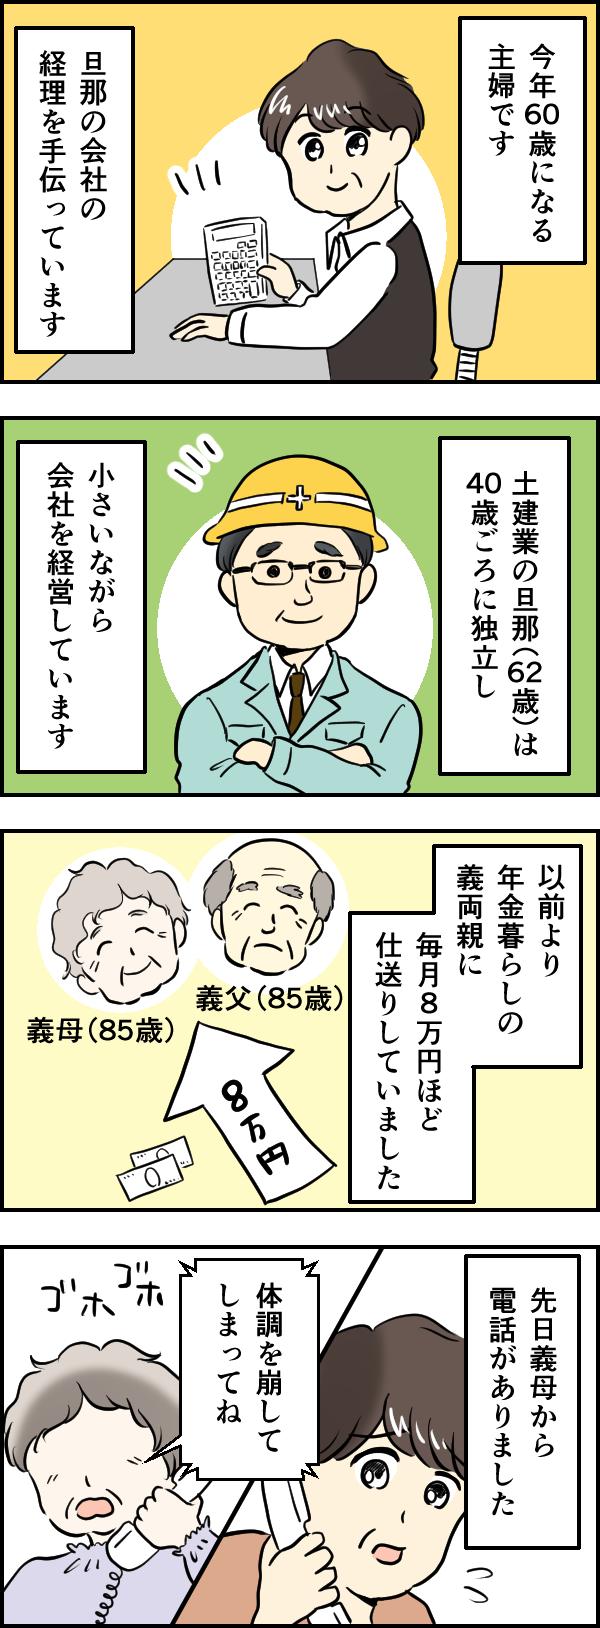 kansei_001.png